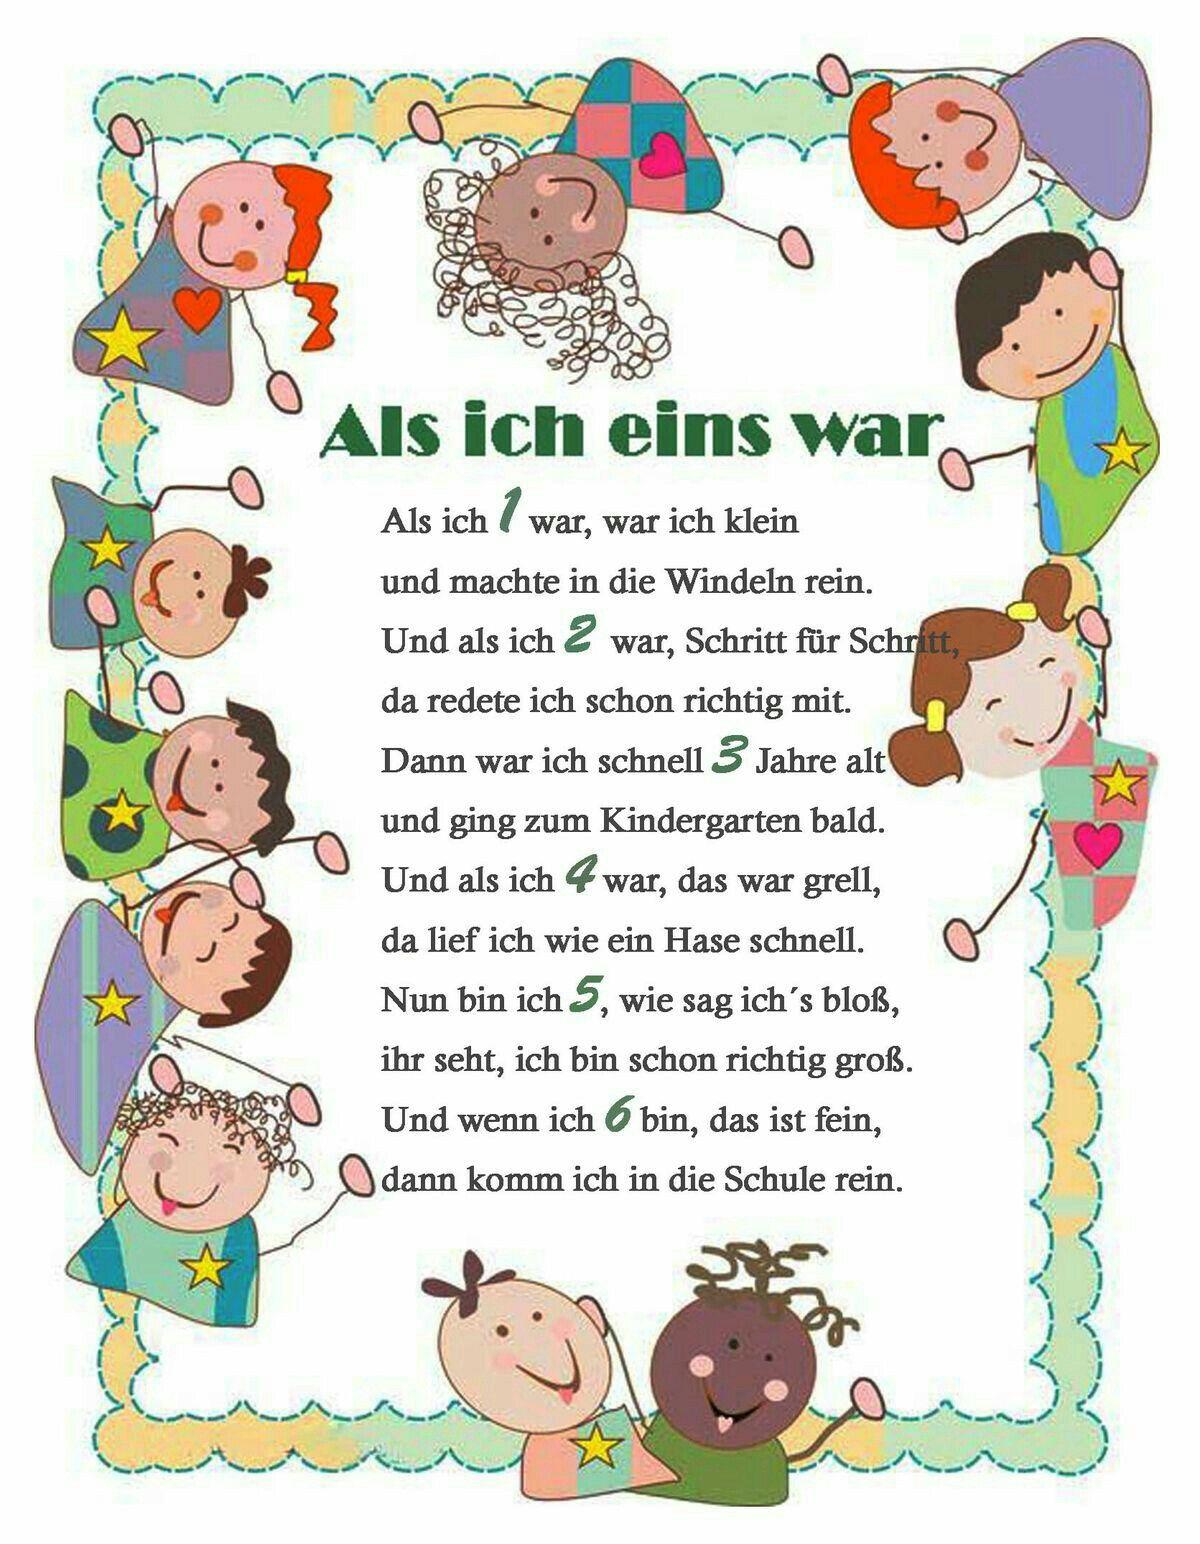 KiGaPortal | Elternabend kindergarten, Kindergartenbeginn, Kennenlernspiele kindergarten